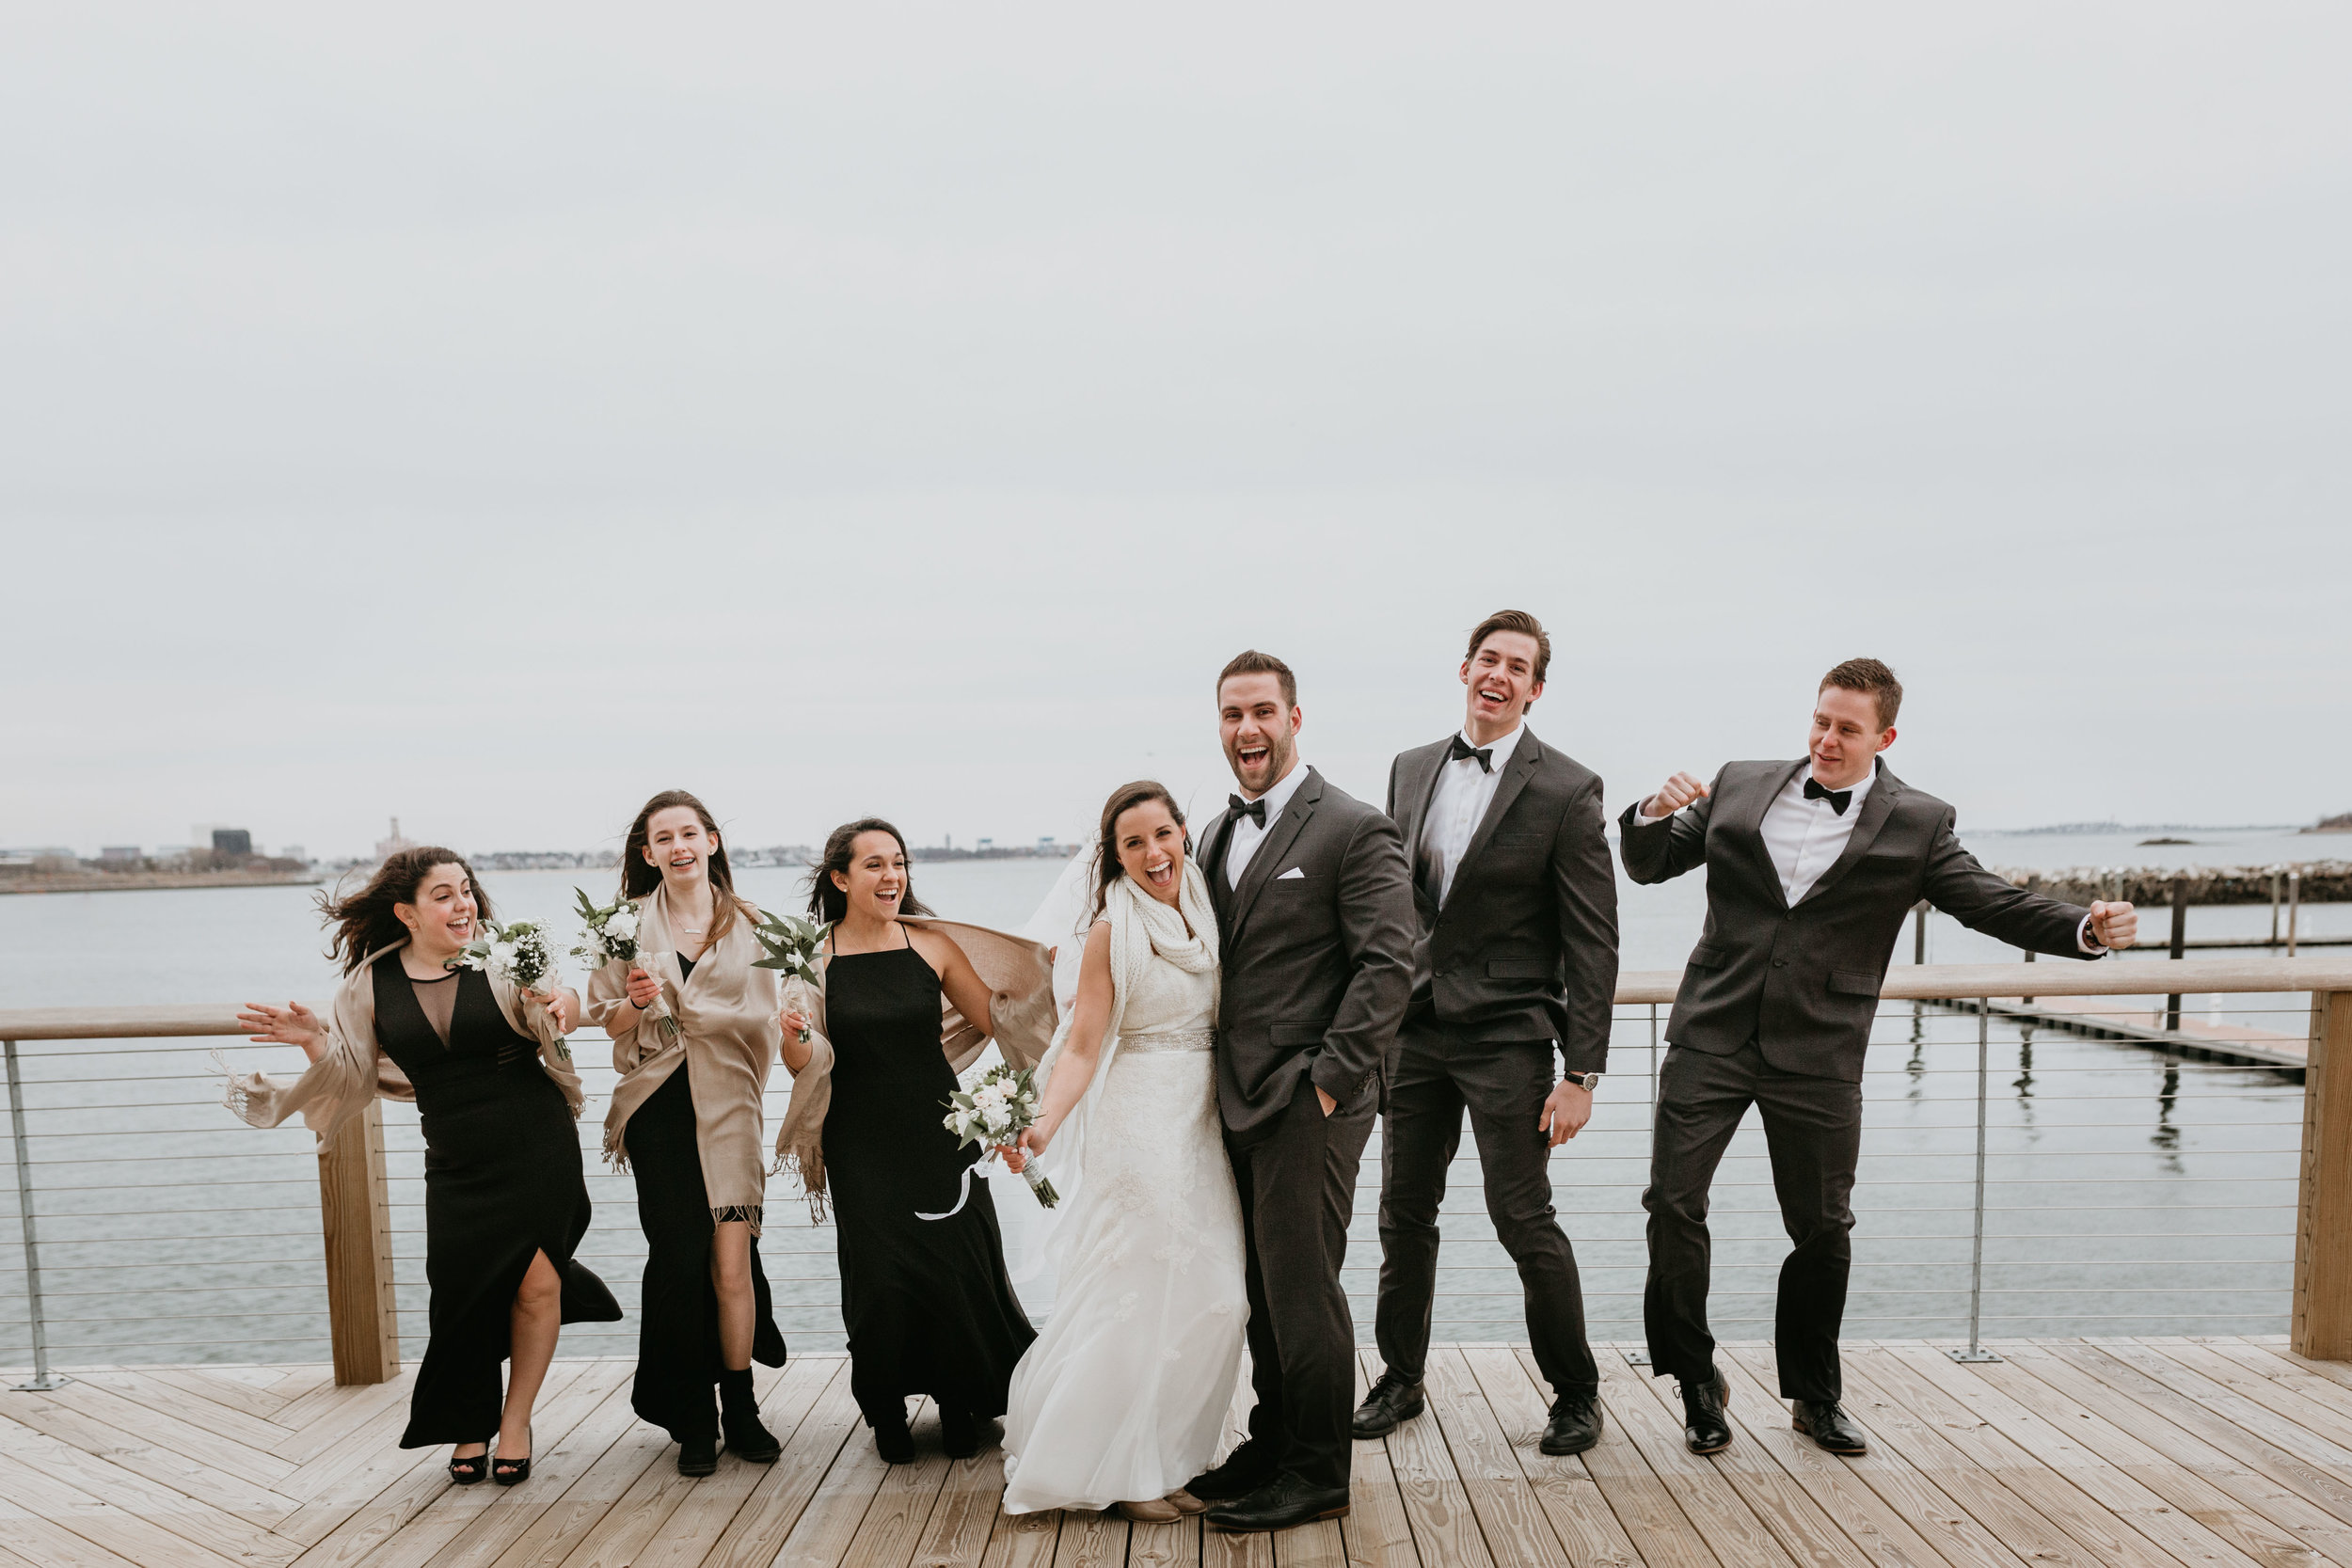 nicole-daacke-photography-boston-massachusetts-seaside-intimate-winter-wedding-photographer-32.jpg